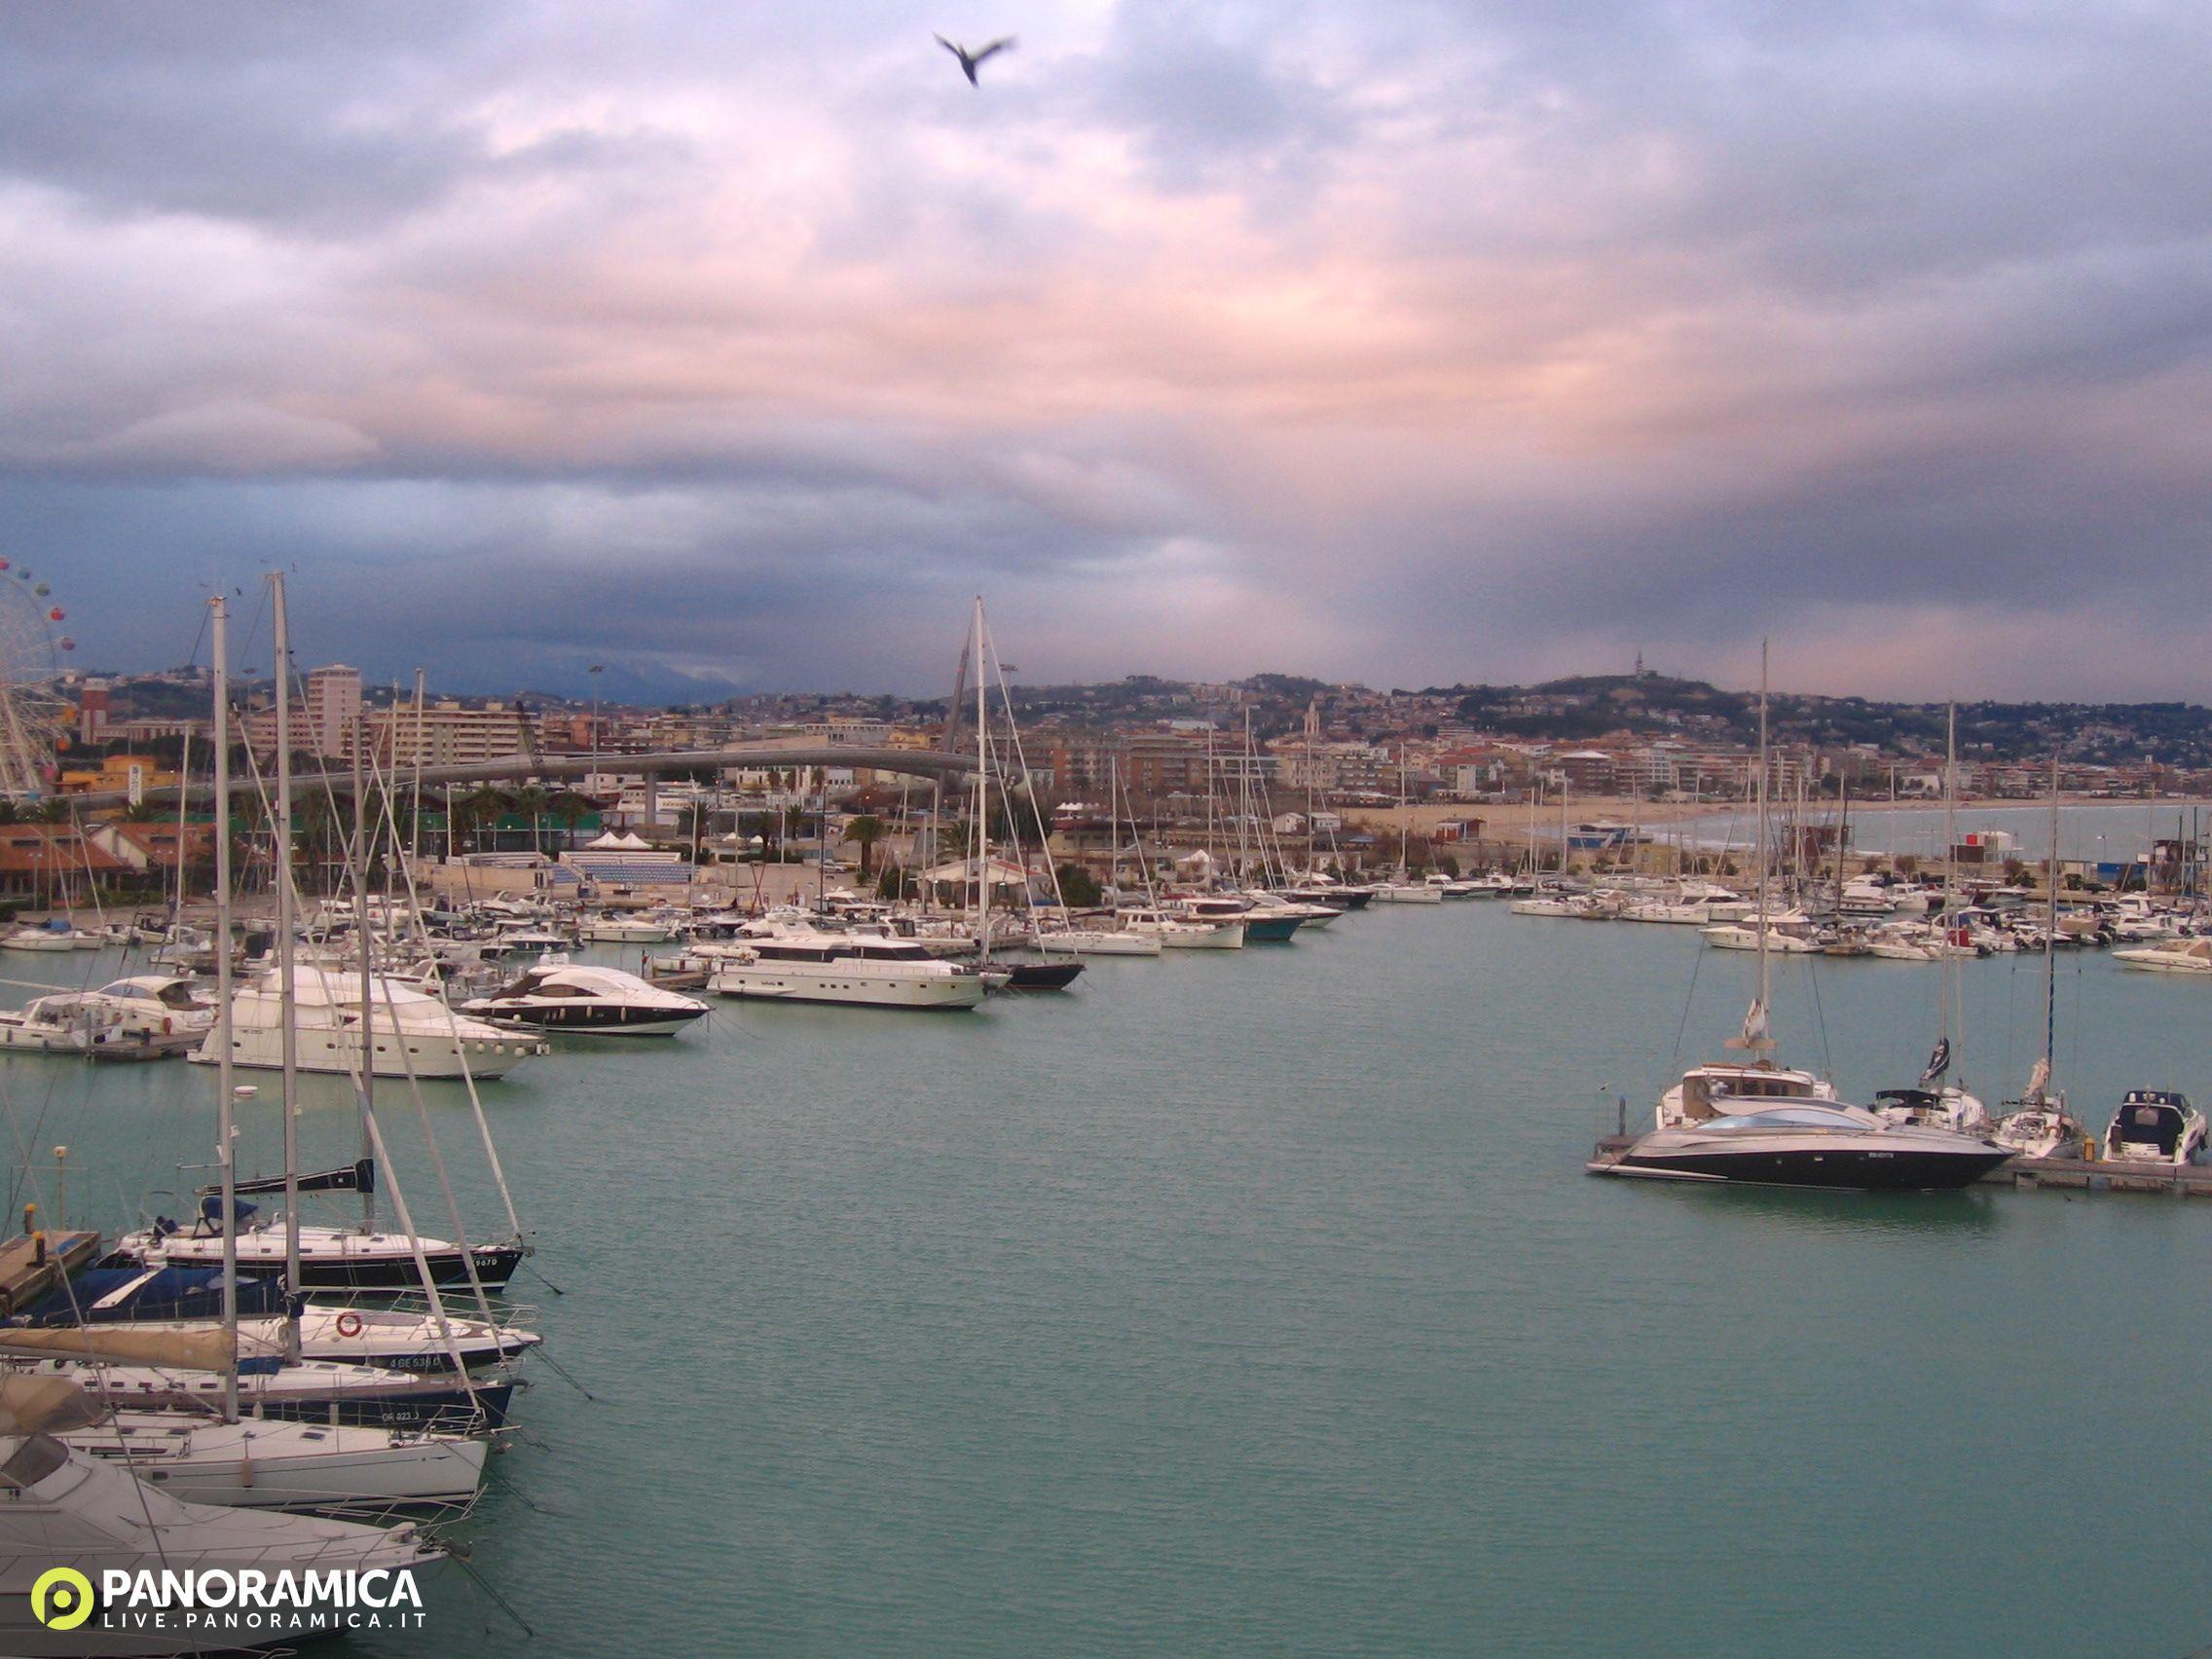 Pescara Camera Live : Pescara live panoramica.it: foto del 29 12 2017 08:00